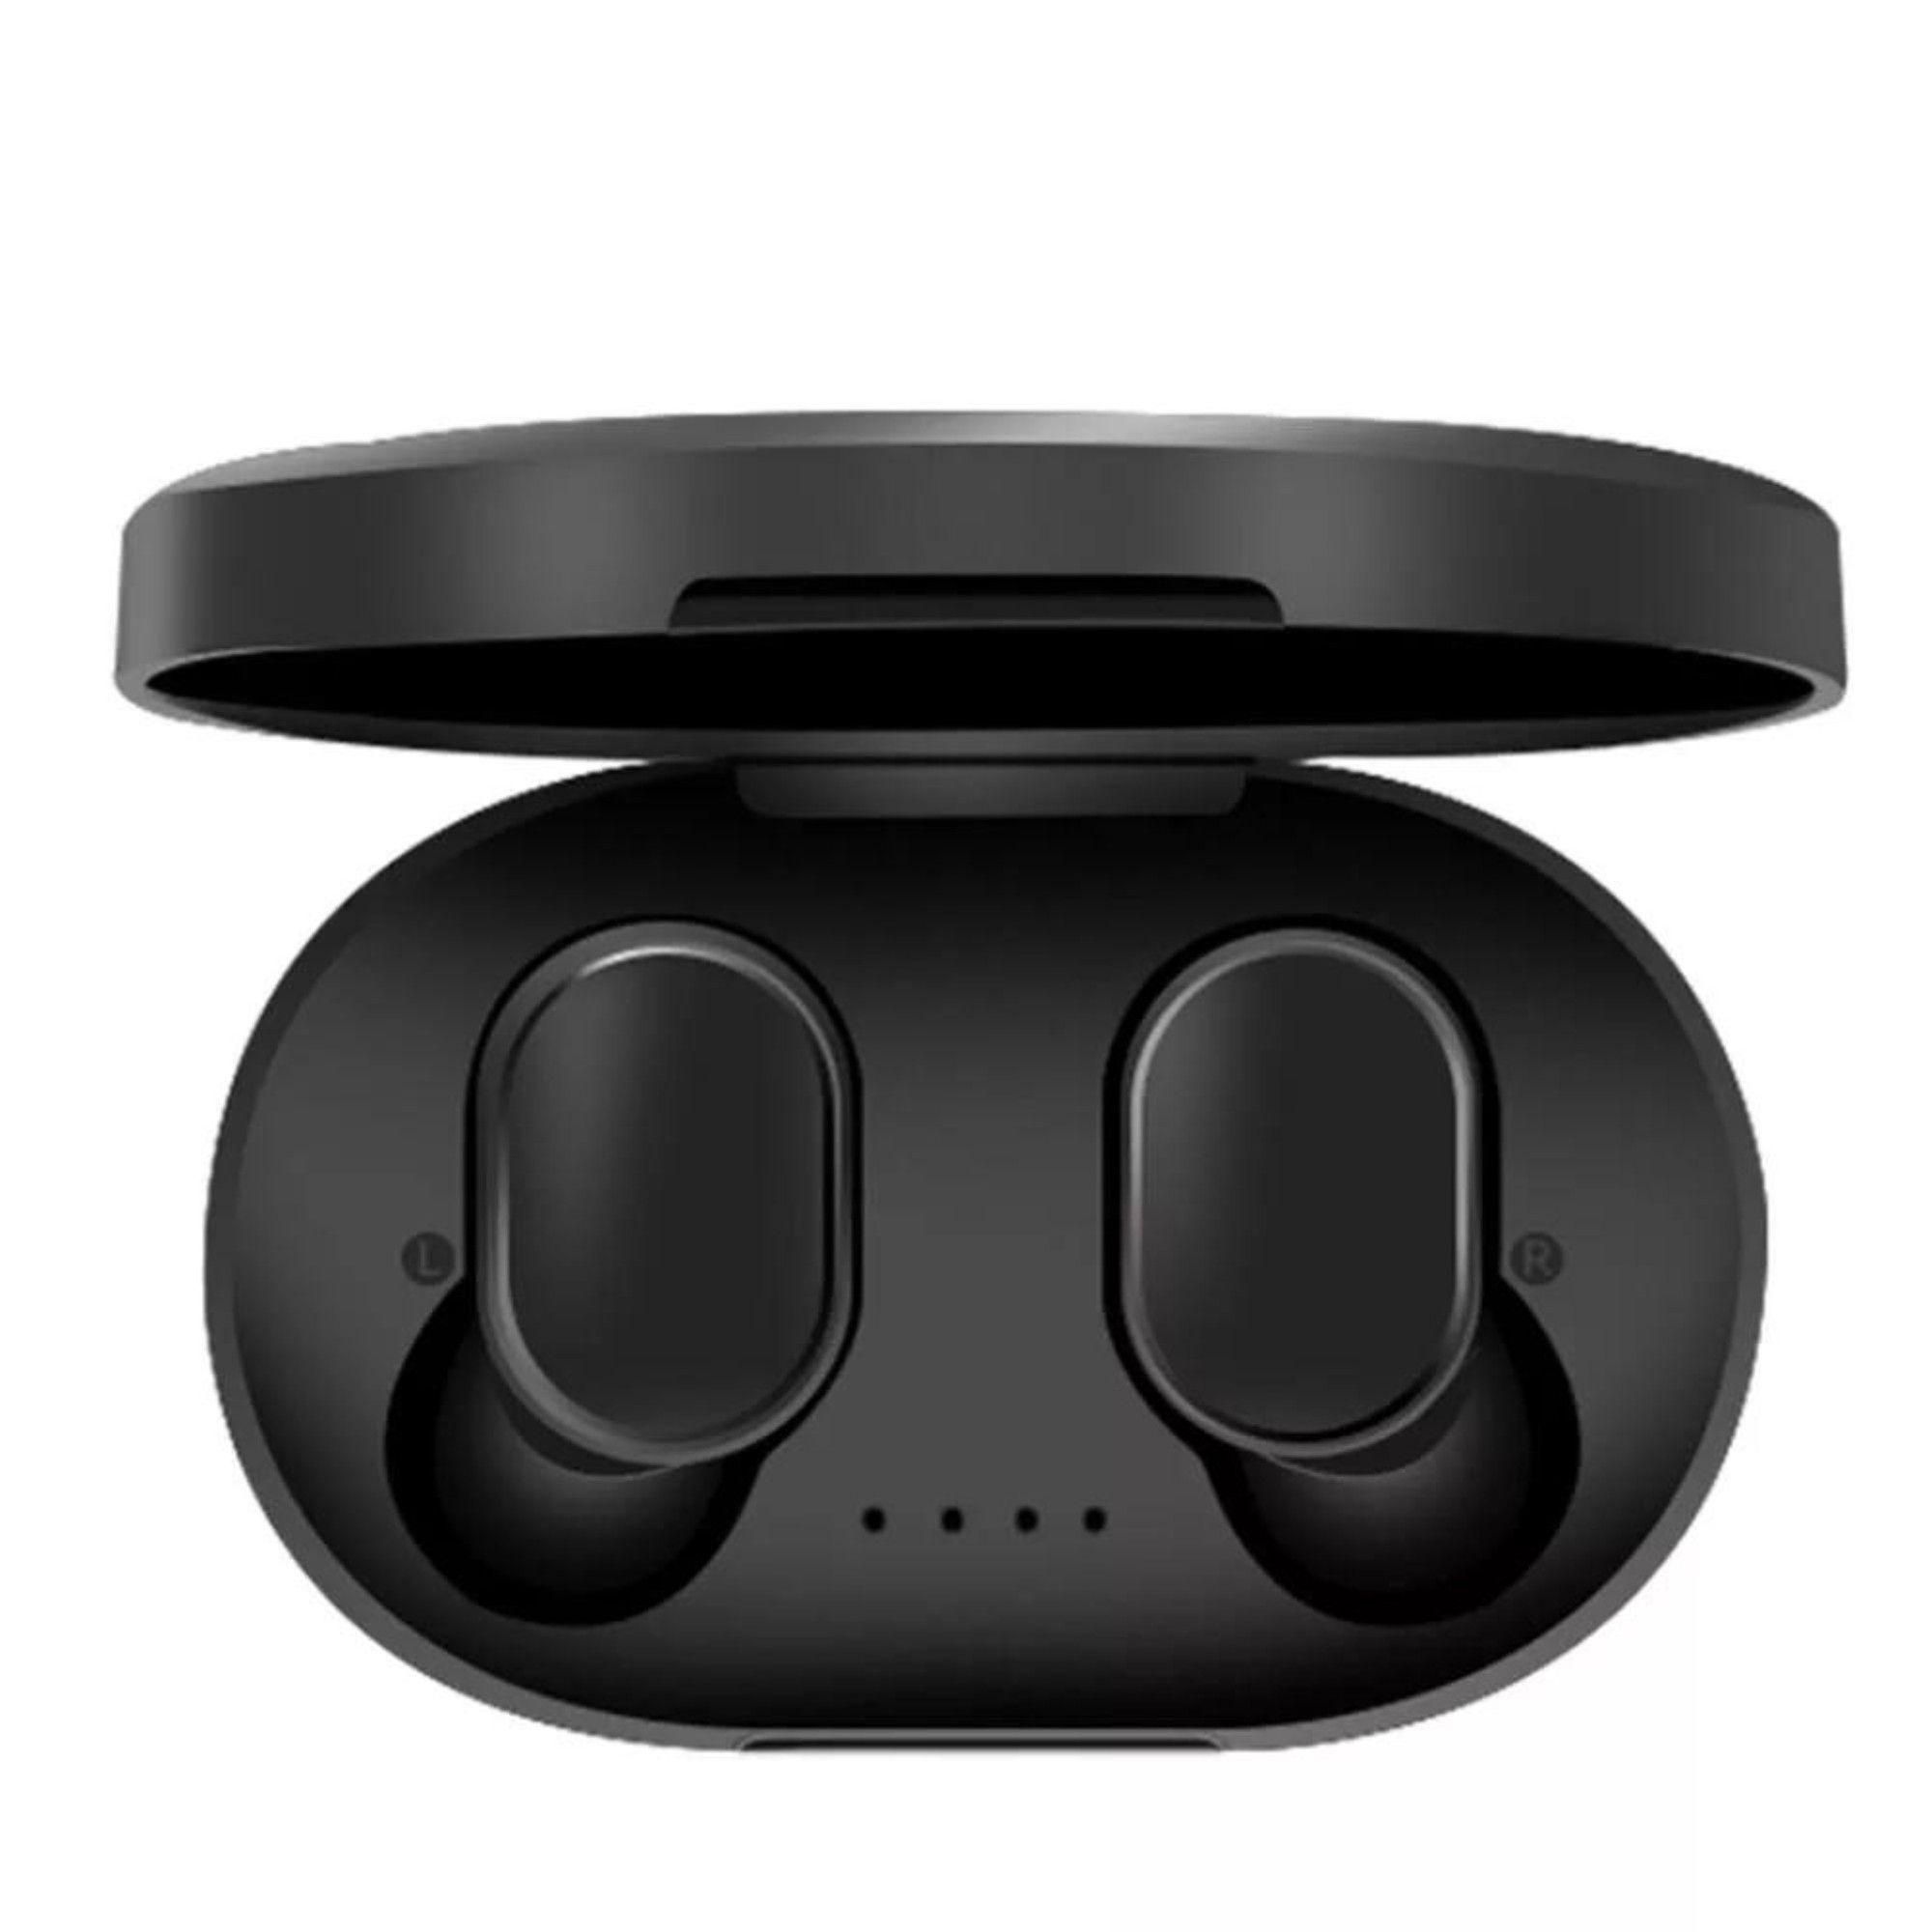 Fone de Ouvido Bluetooth A6S Tipo Xiaomi